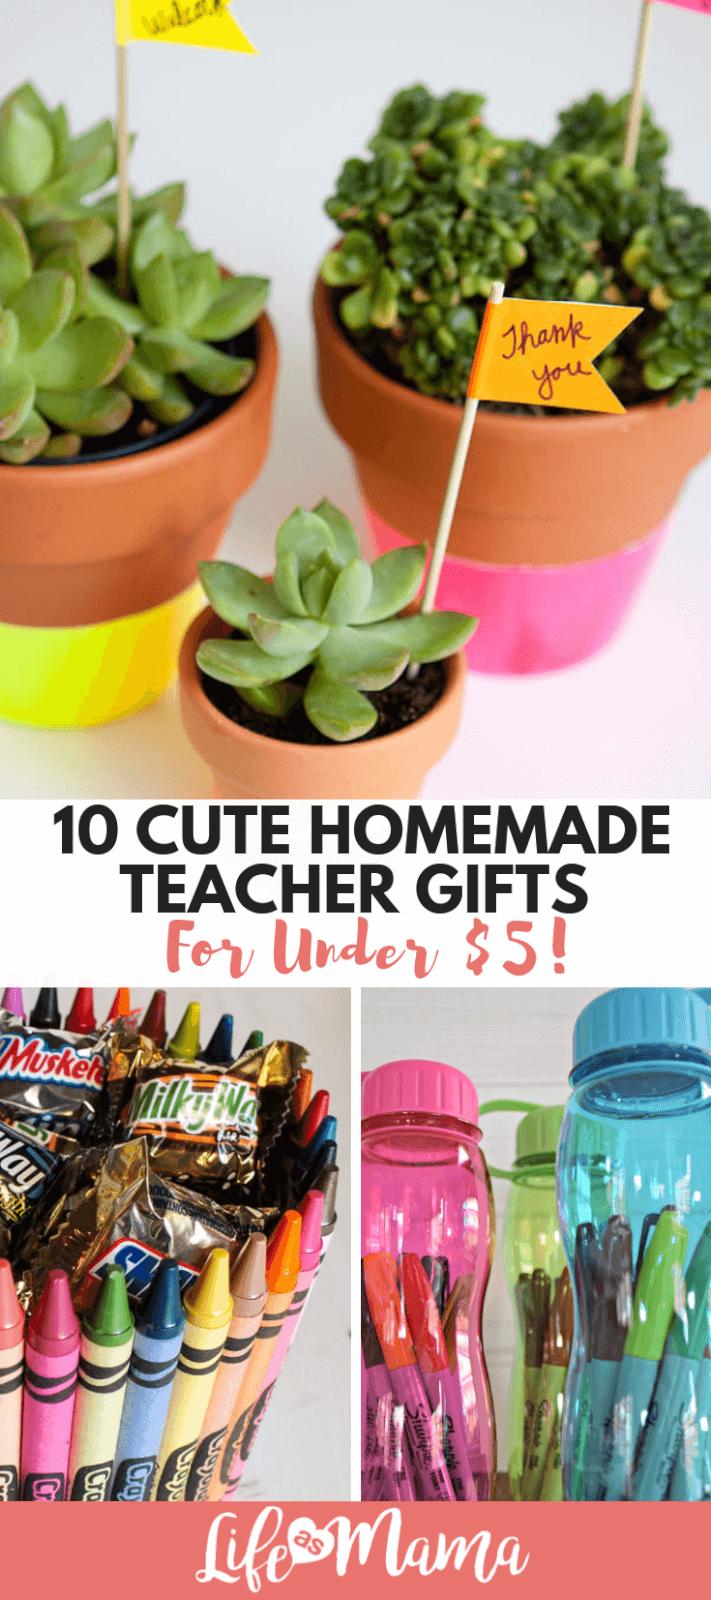 10 Cute Homemade Teacher Gifts For Under $5!